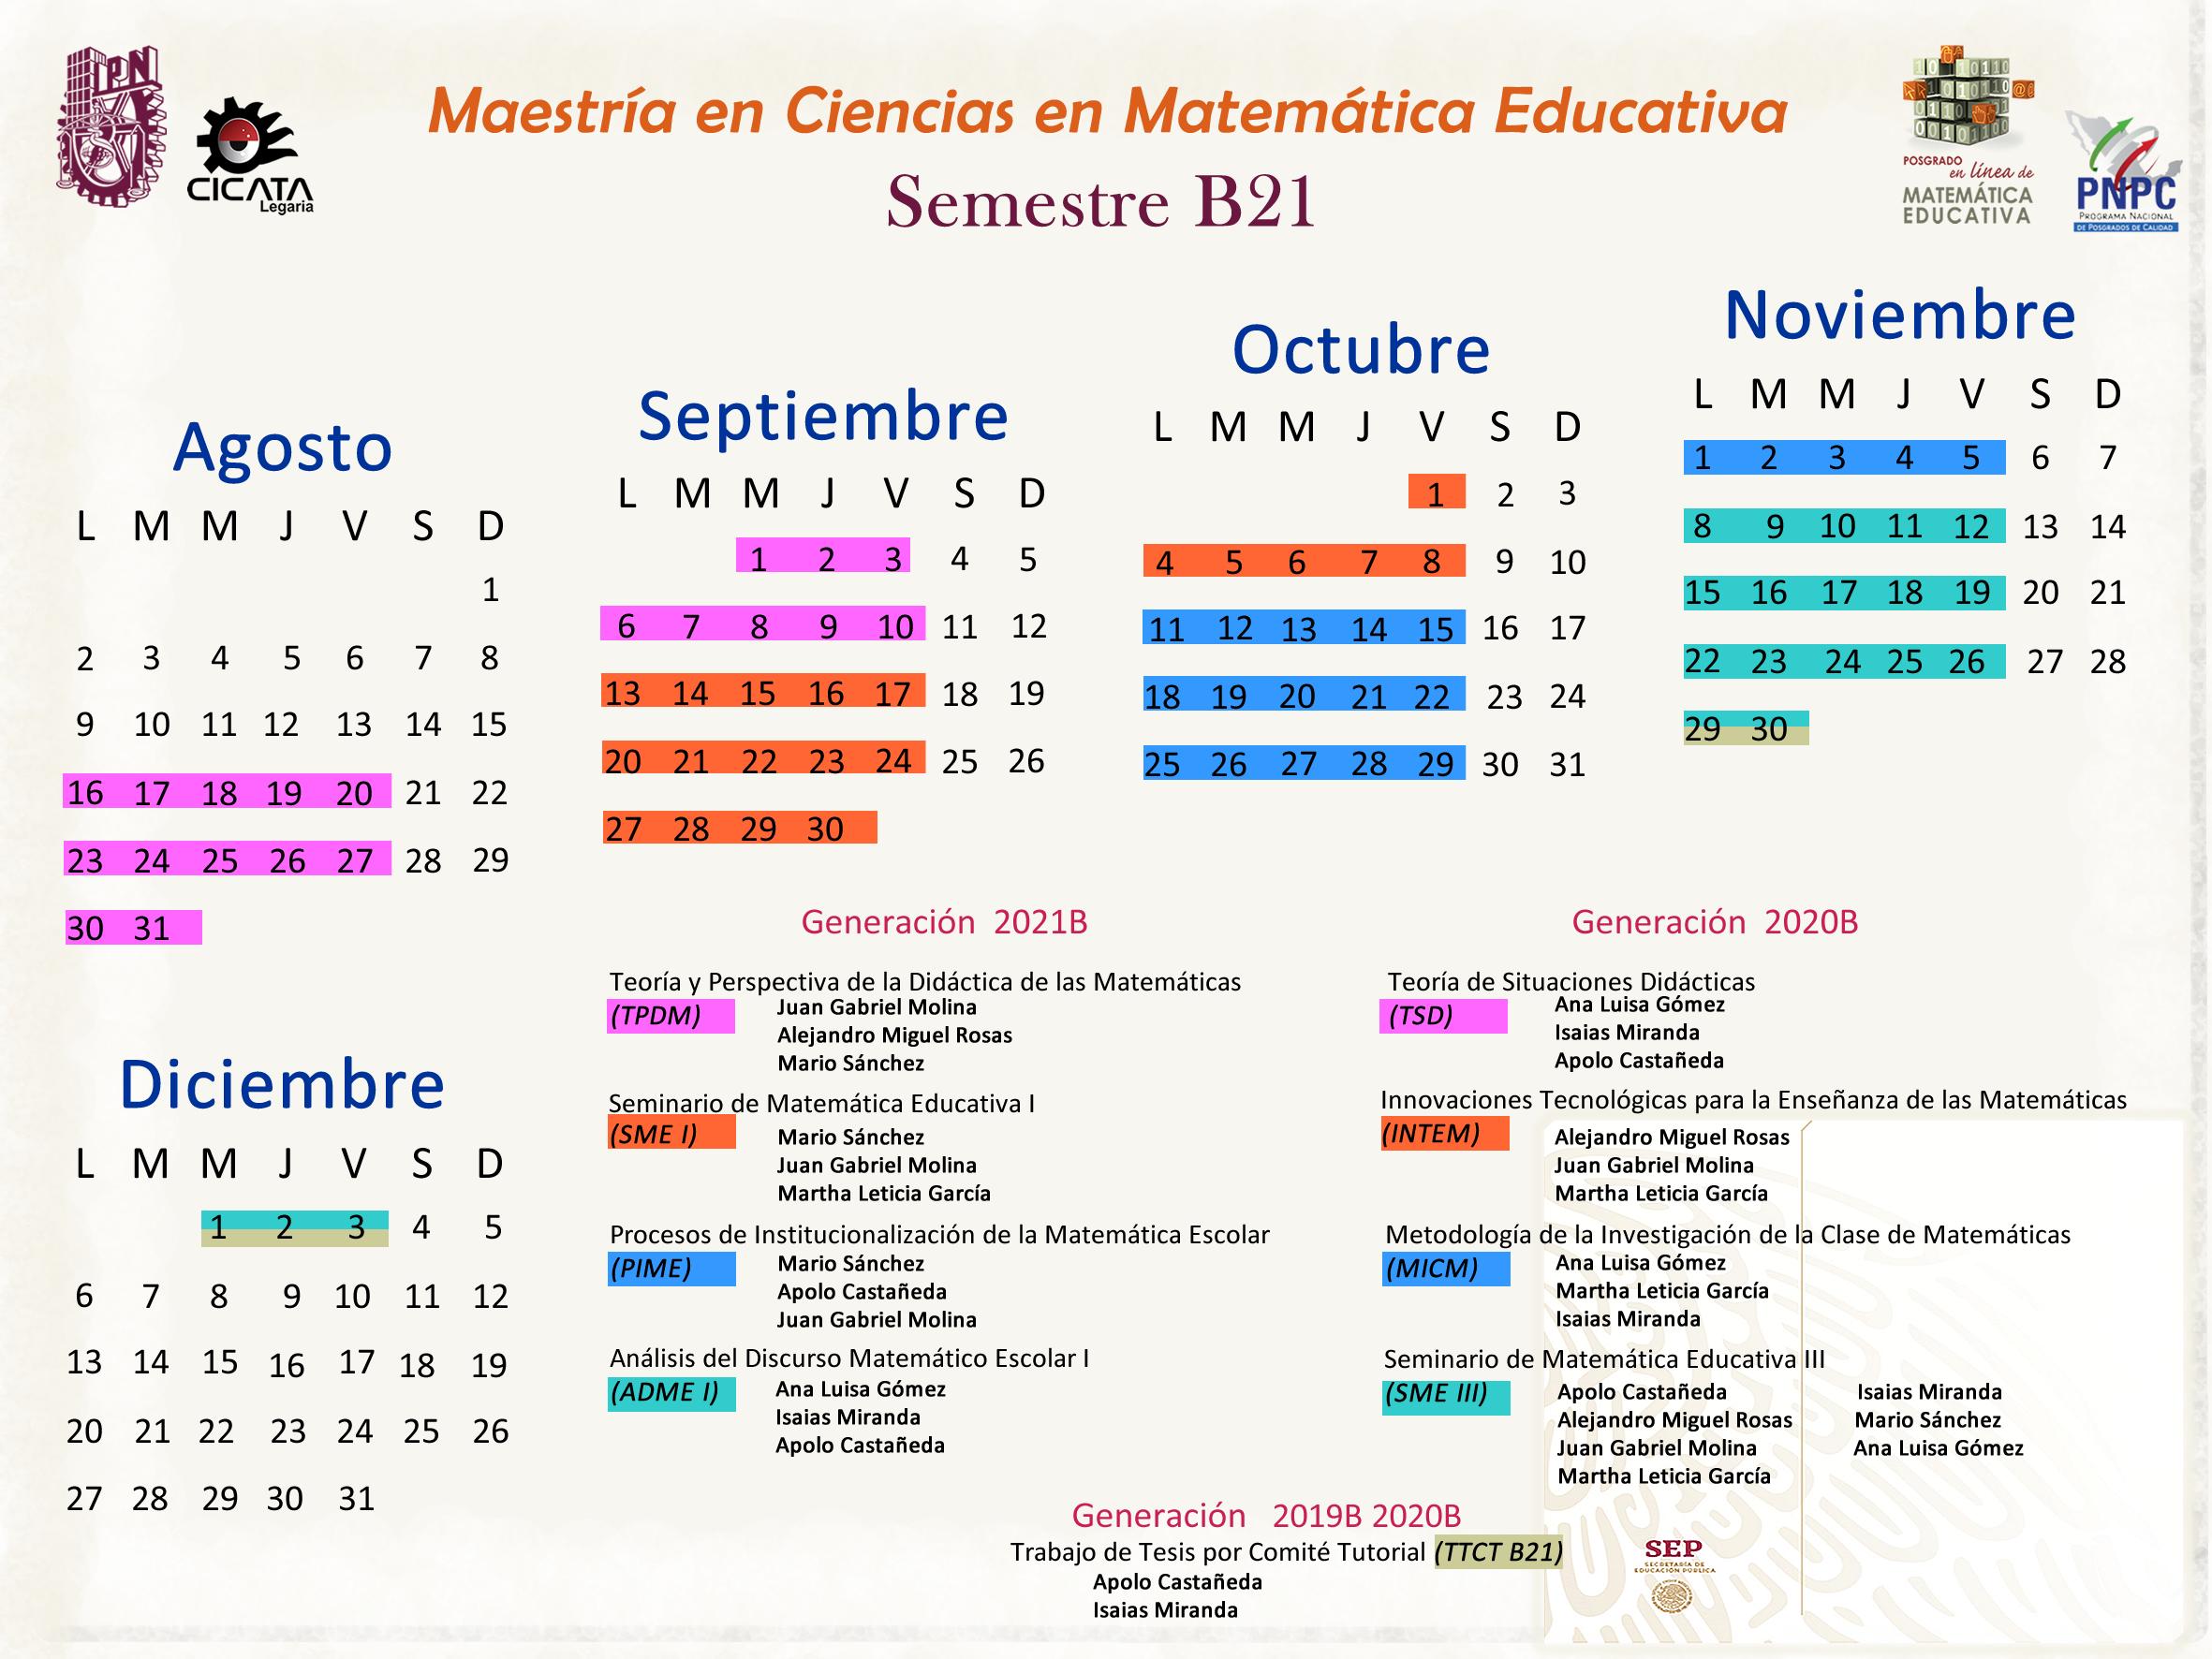 Calendario de UAMaestria